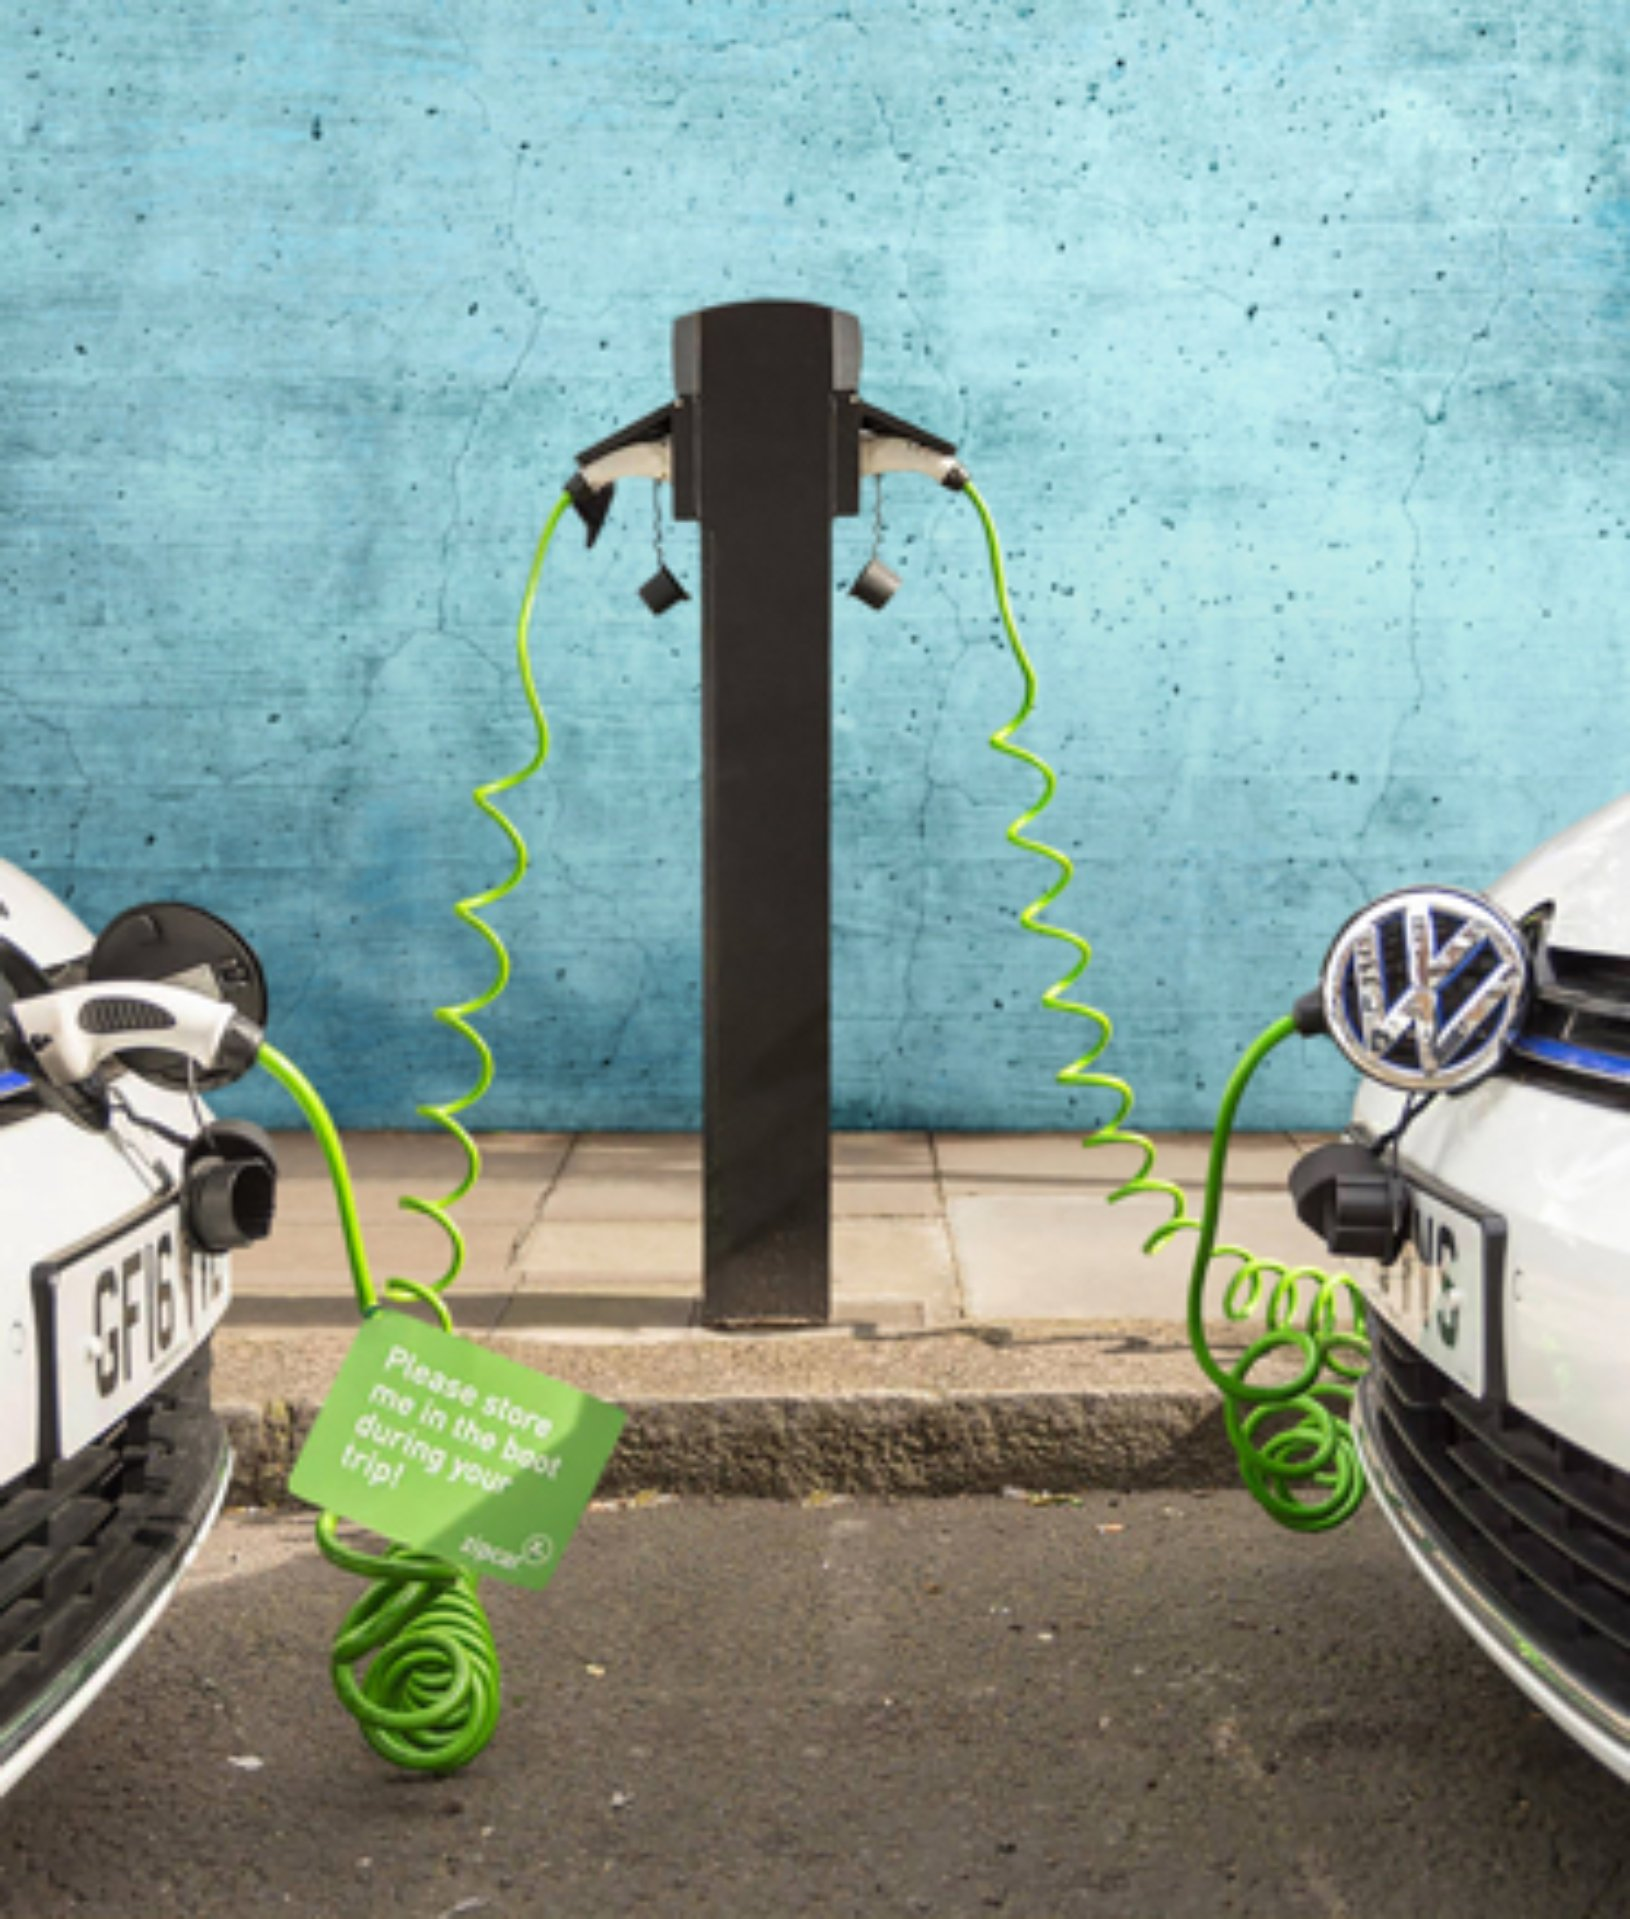 electric car sharing charging bays